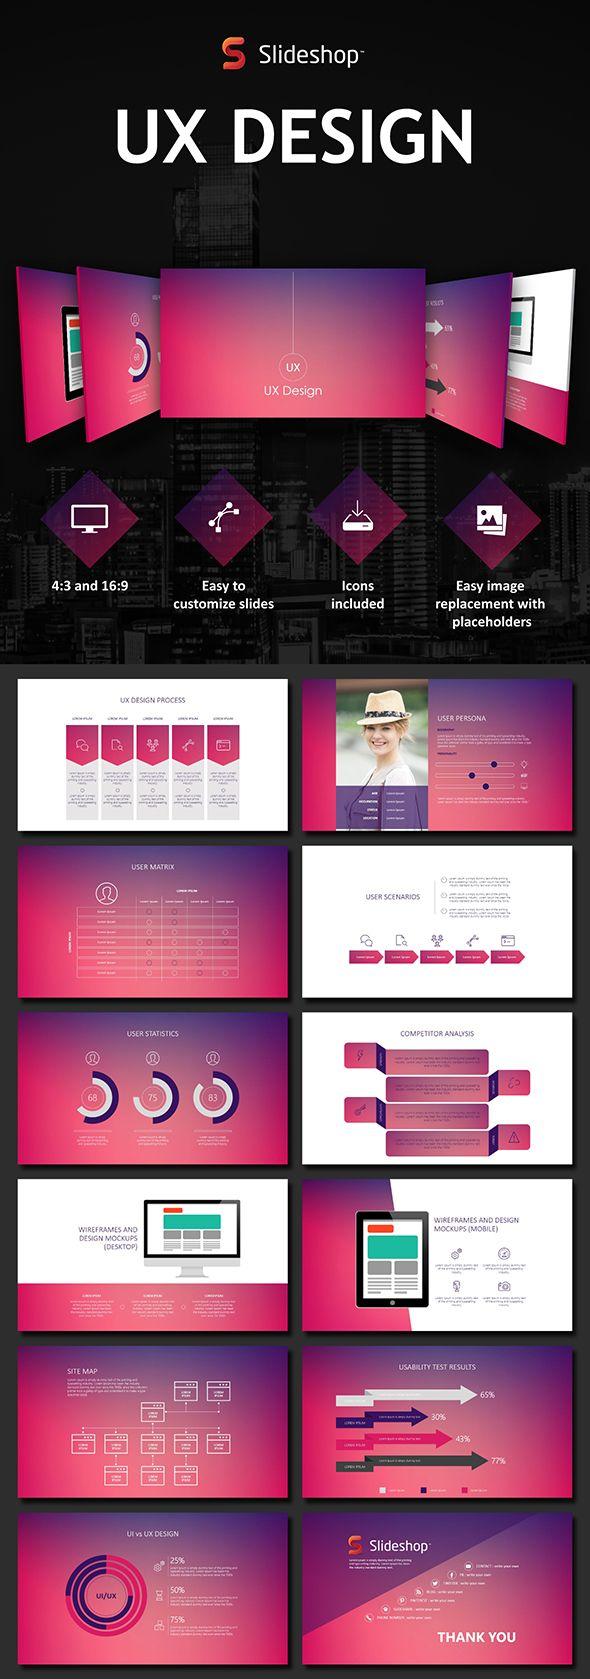 ux design - powerpoint templates presentation templates, Presentation templates